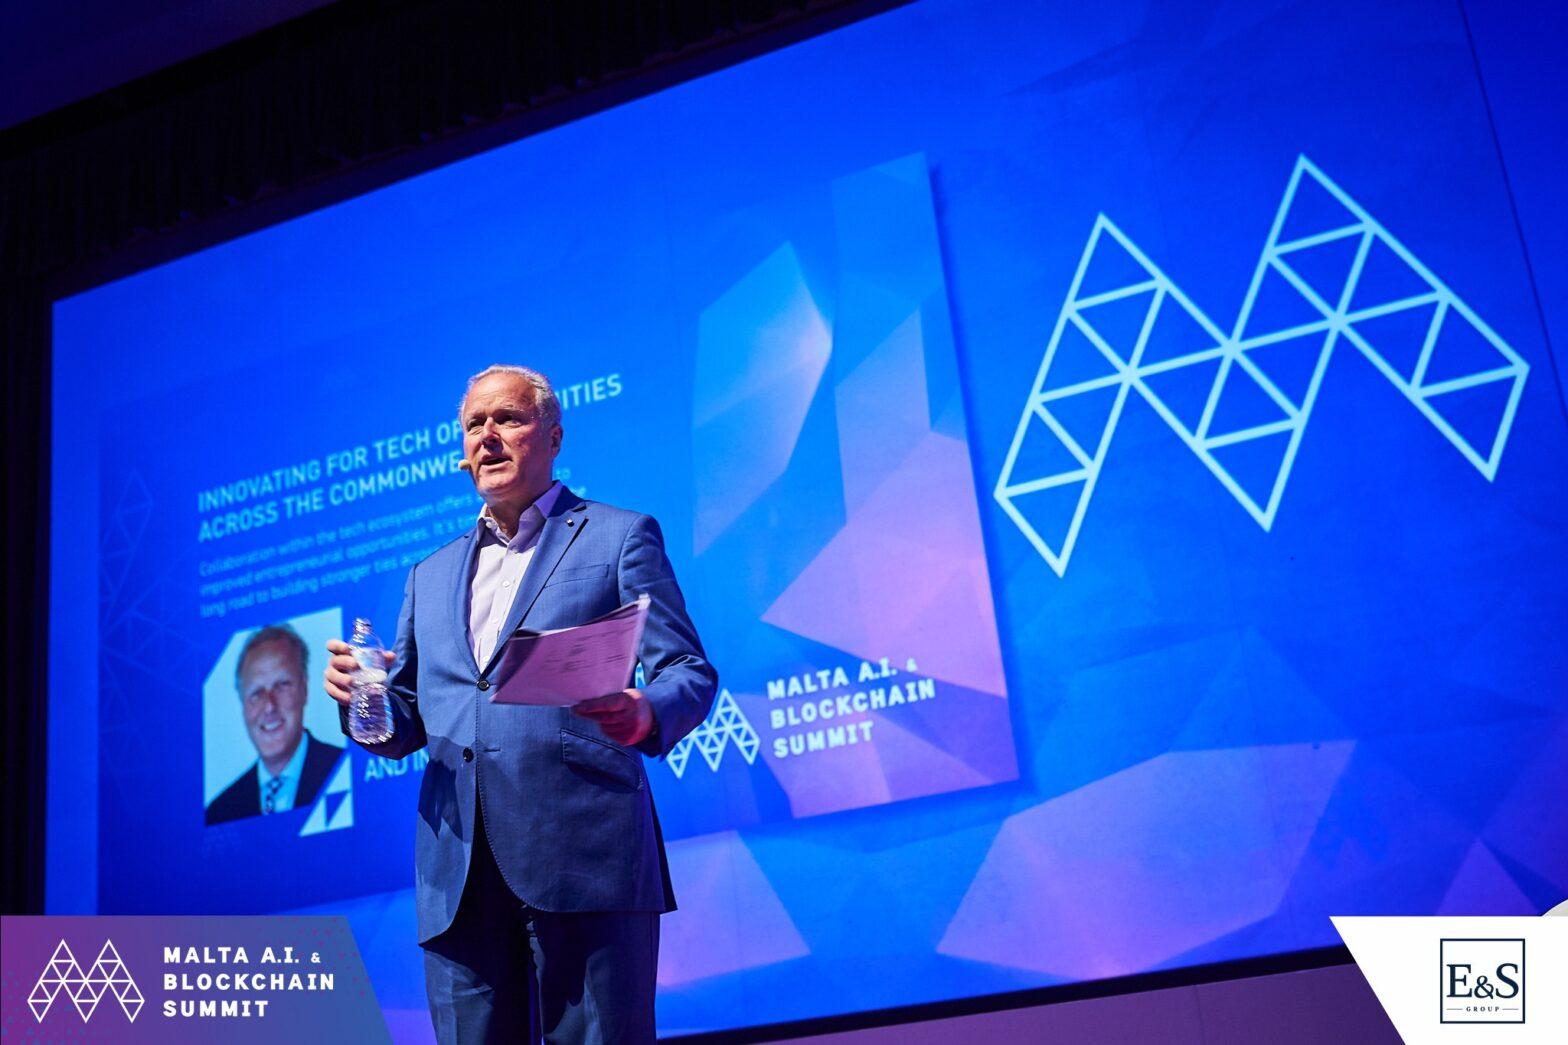 Commonwealth Session at the Malta A.I. & Blockchain Summit, April 2019